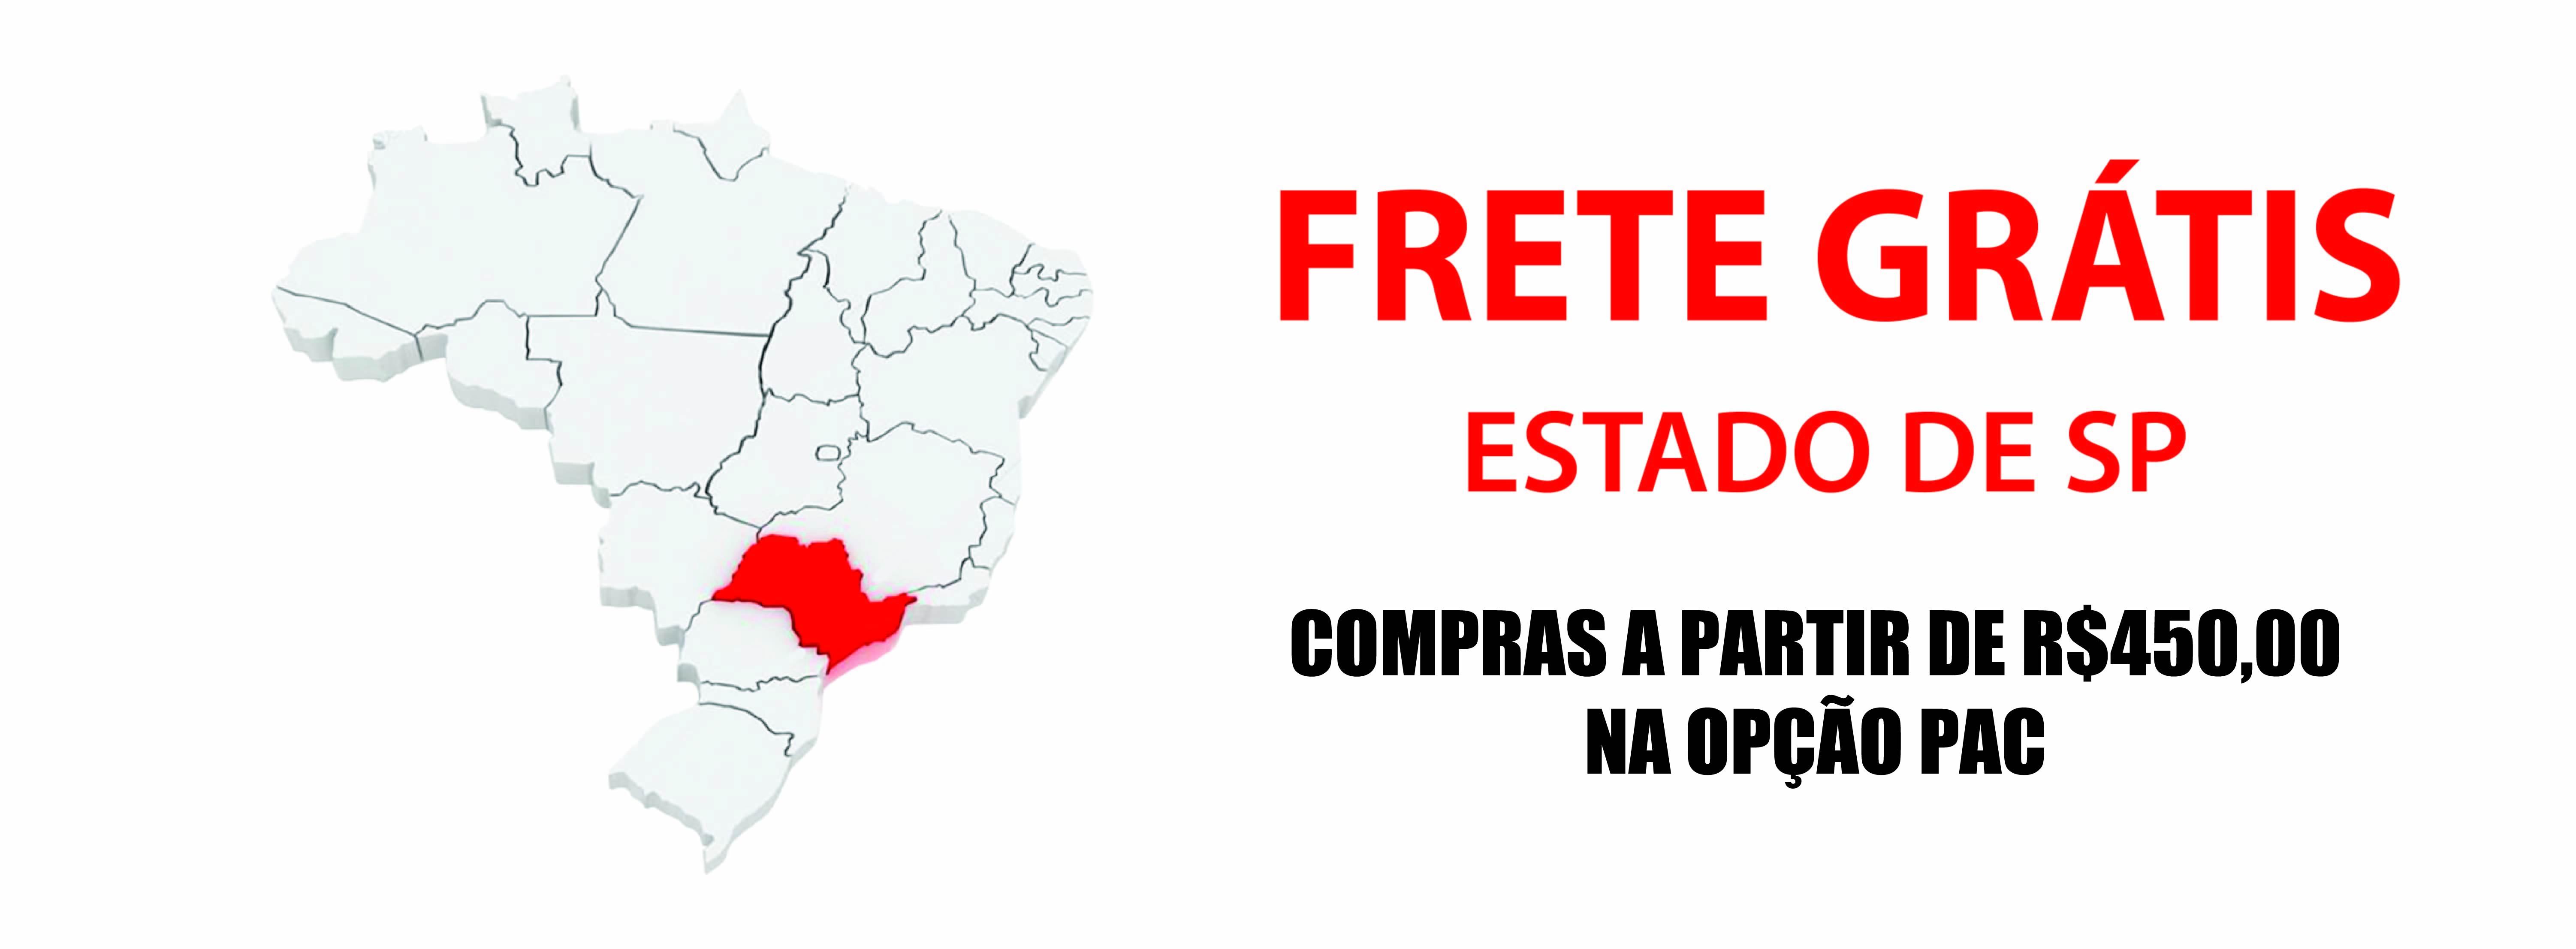 Frete gratis Estado de SP